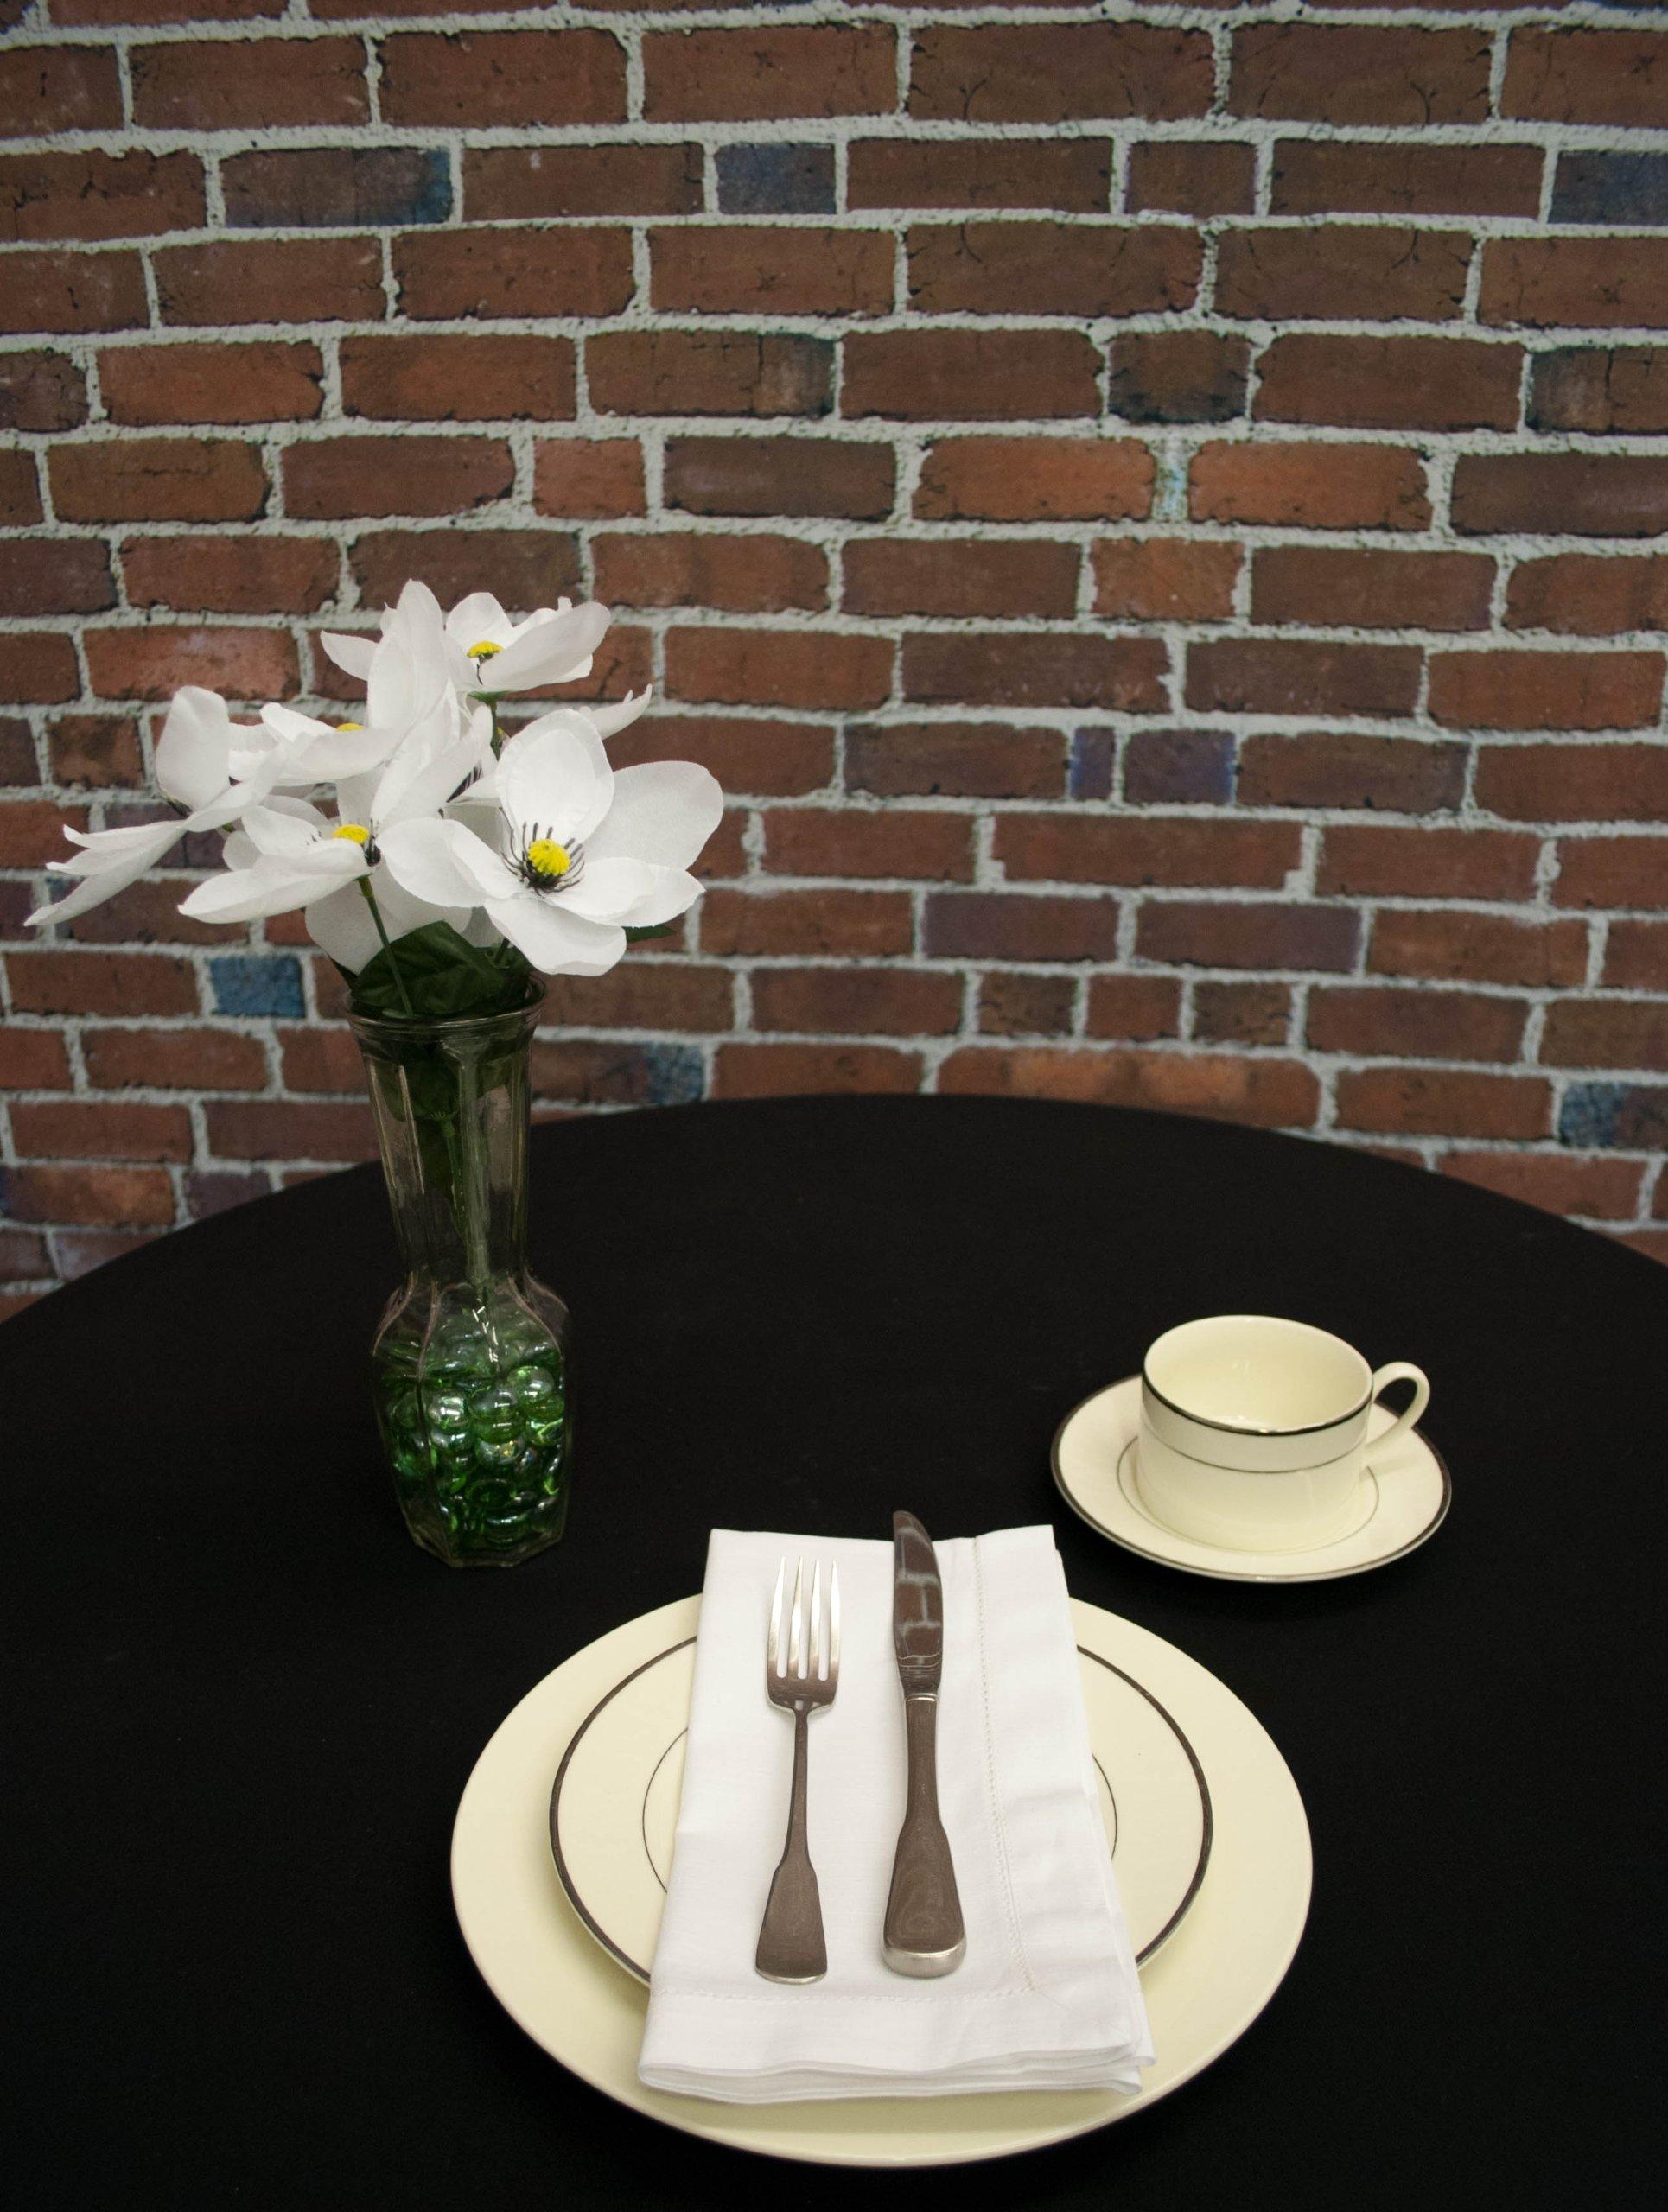 Hemstitch Dinner Napkins White 1 Dozen by Something Different Linen by Something Different Linen (Image #2)